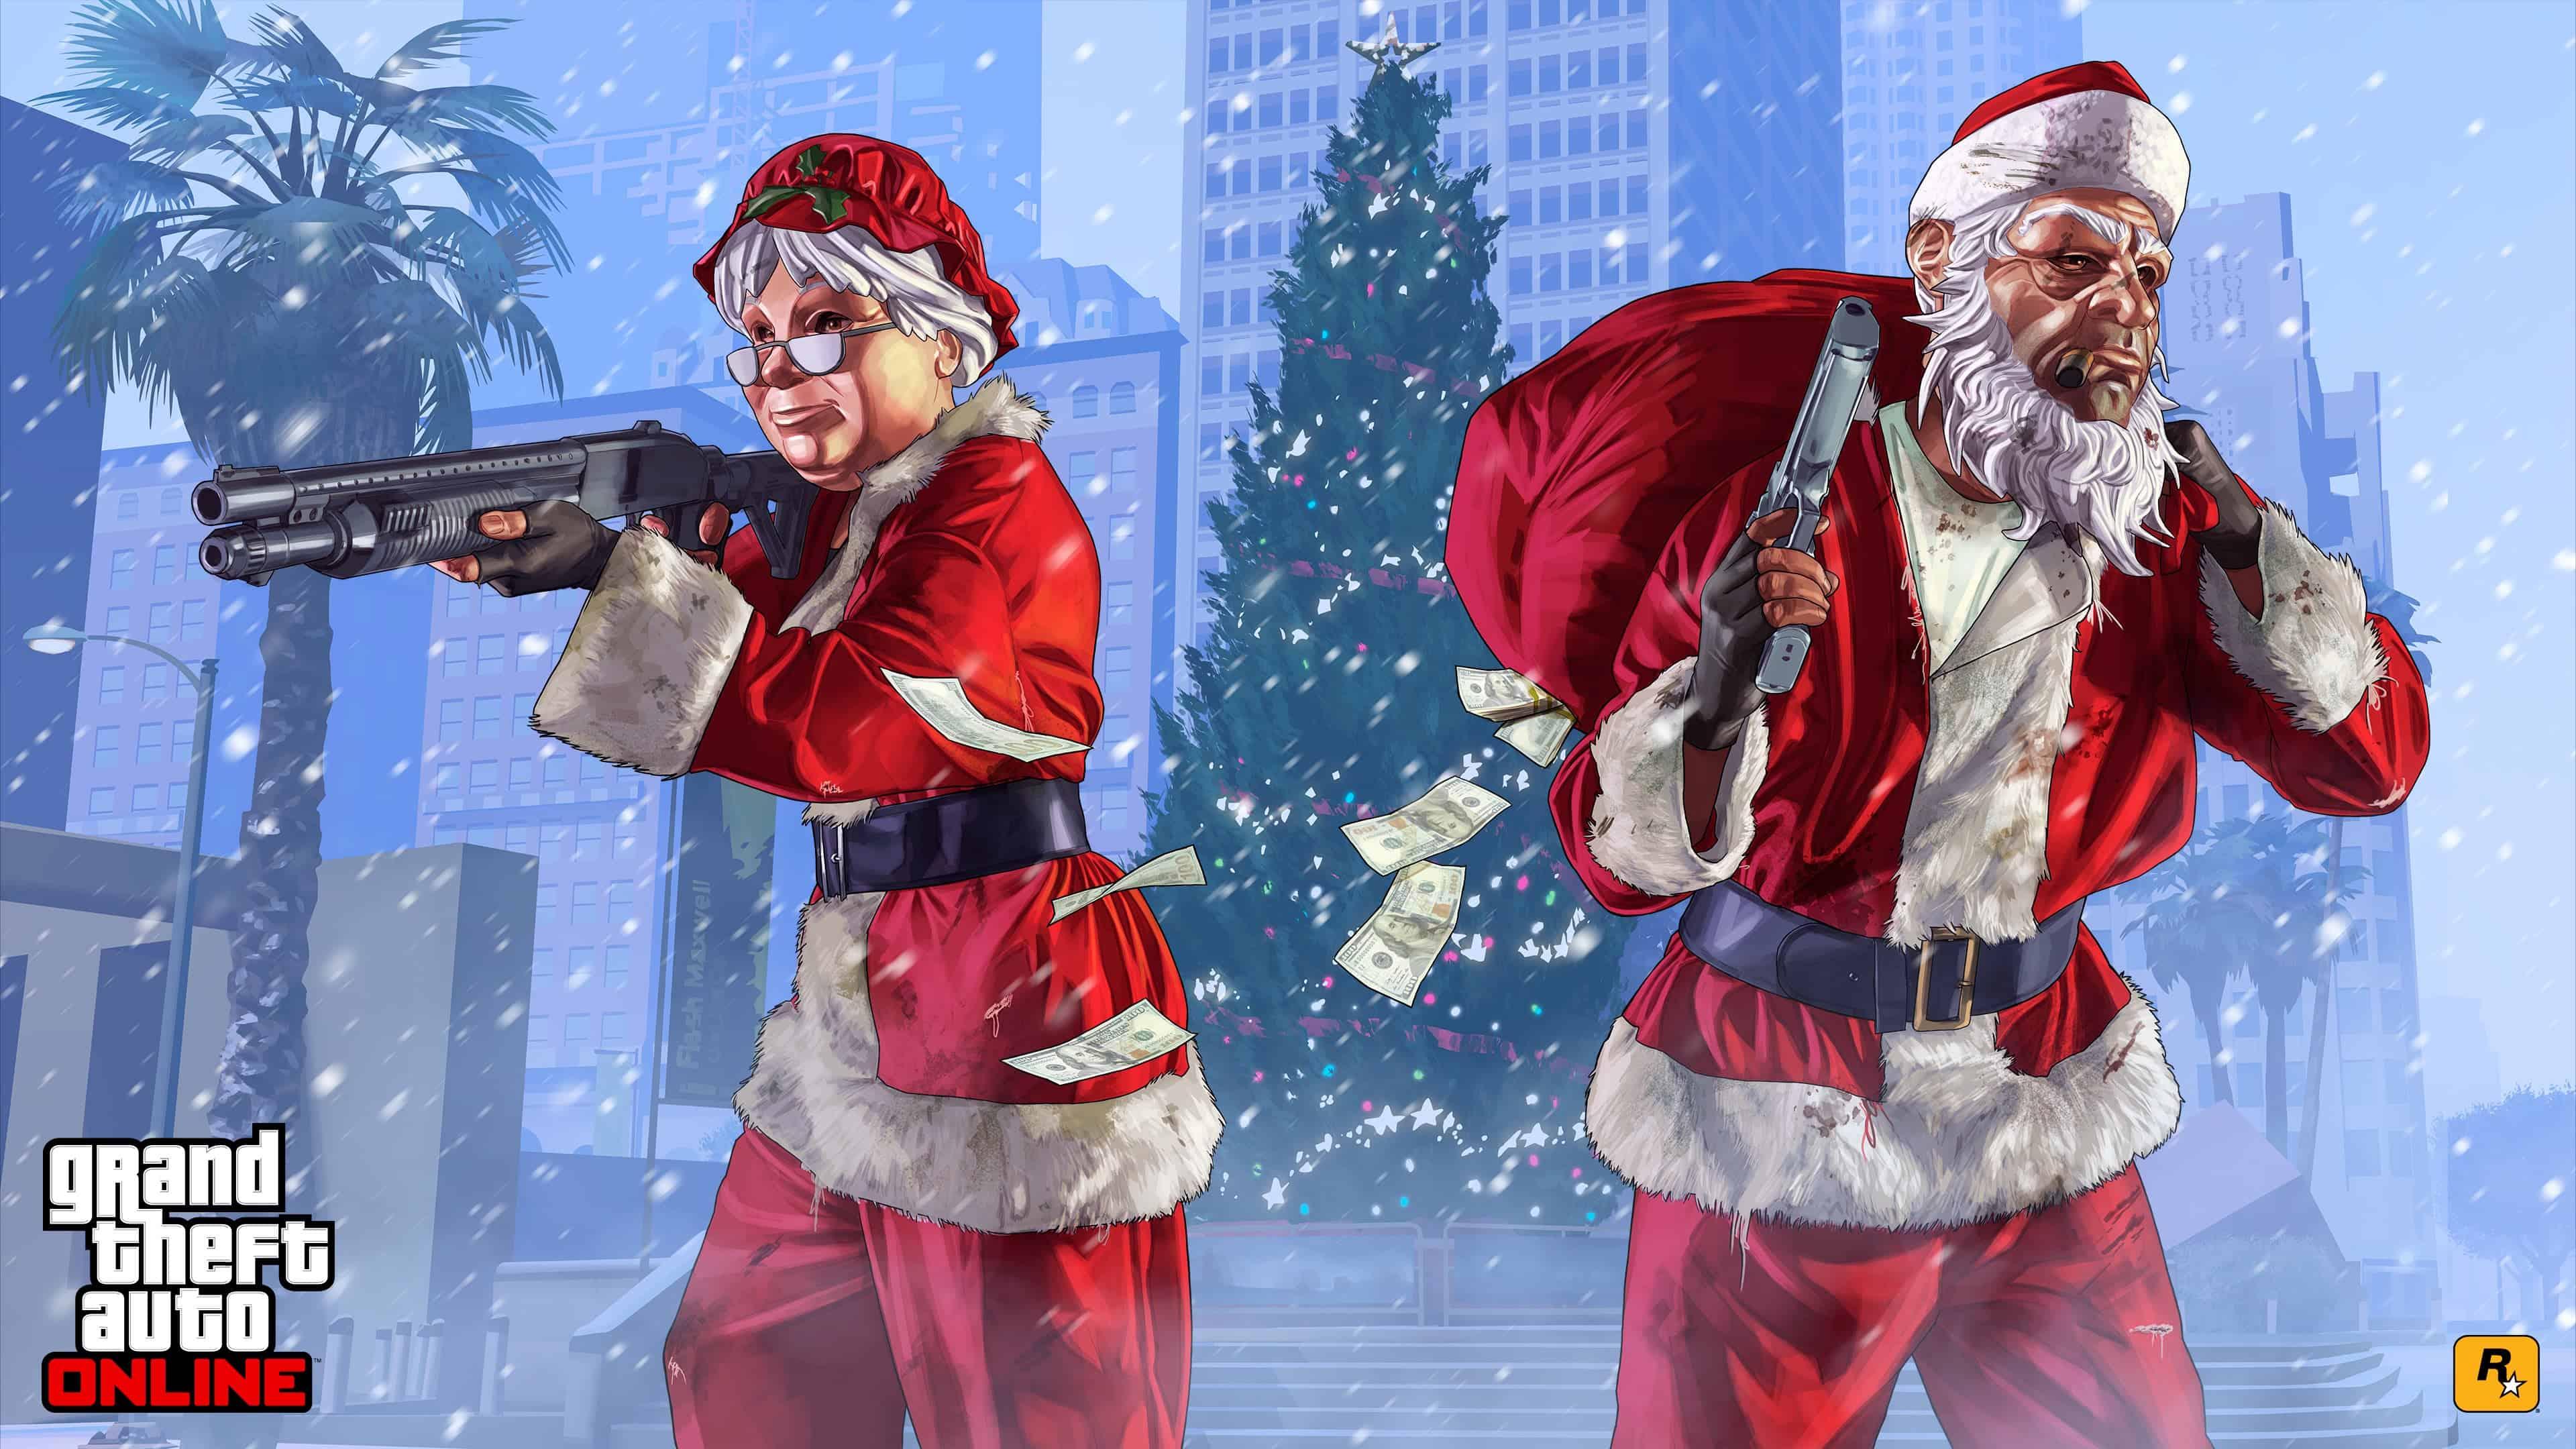 grand theft auto 5 online santa artwork for christmas uhd 4k wallpaper